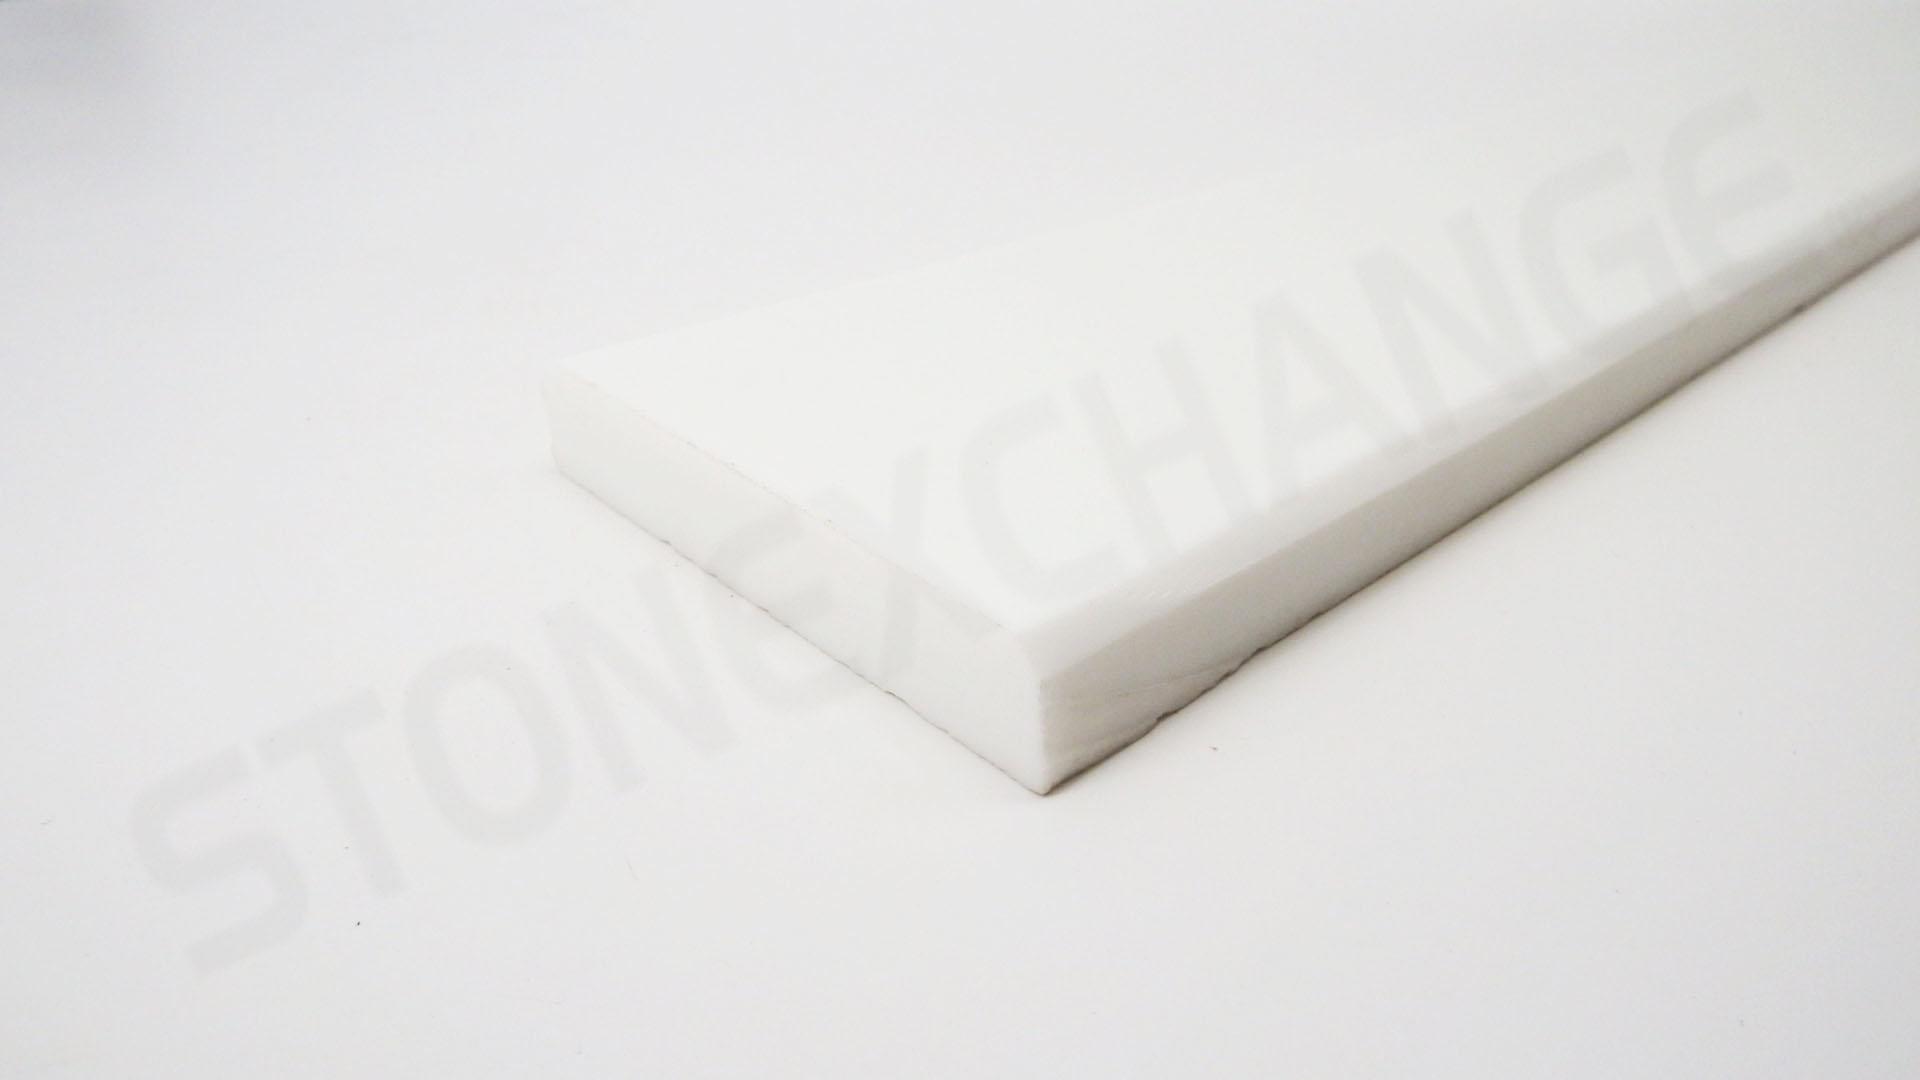 Pure White Engineered Stone Standard Double Bevel 4x36 Threshold